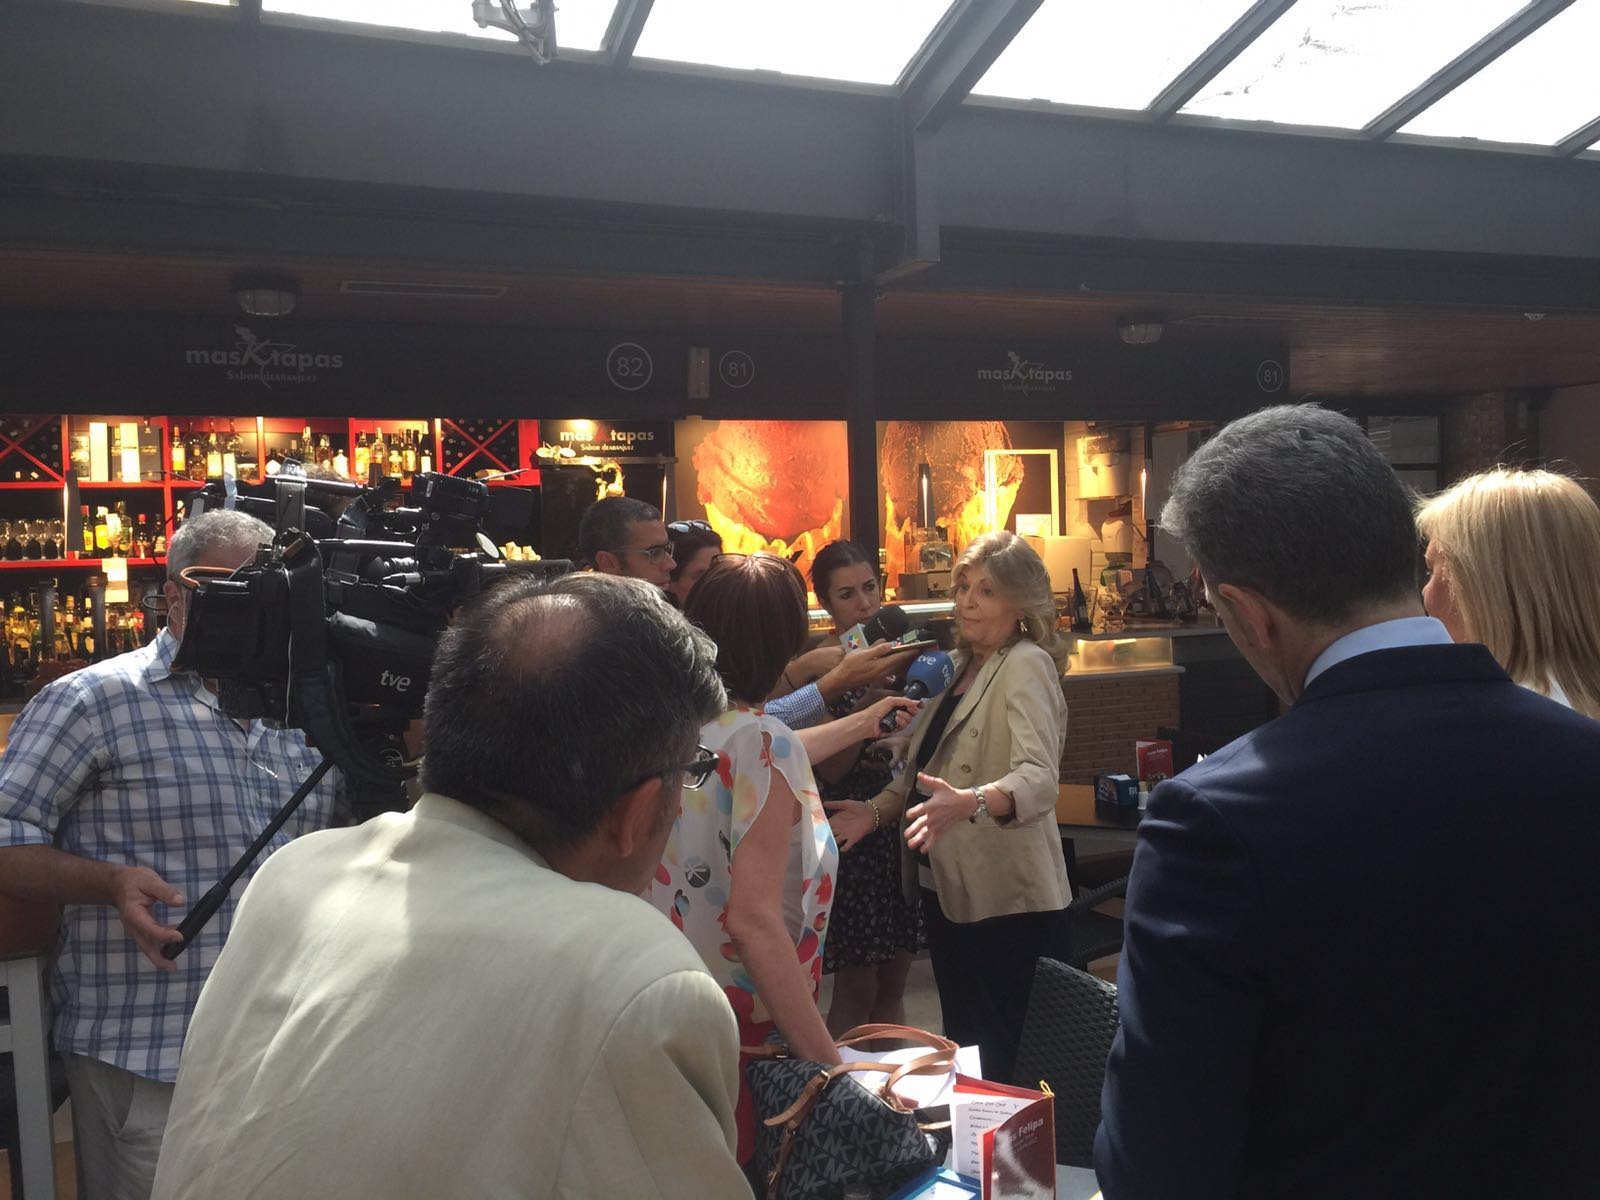 Heraldo de aranjuez visita de la directora general de for Inmobiliaria 2b aranjuez